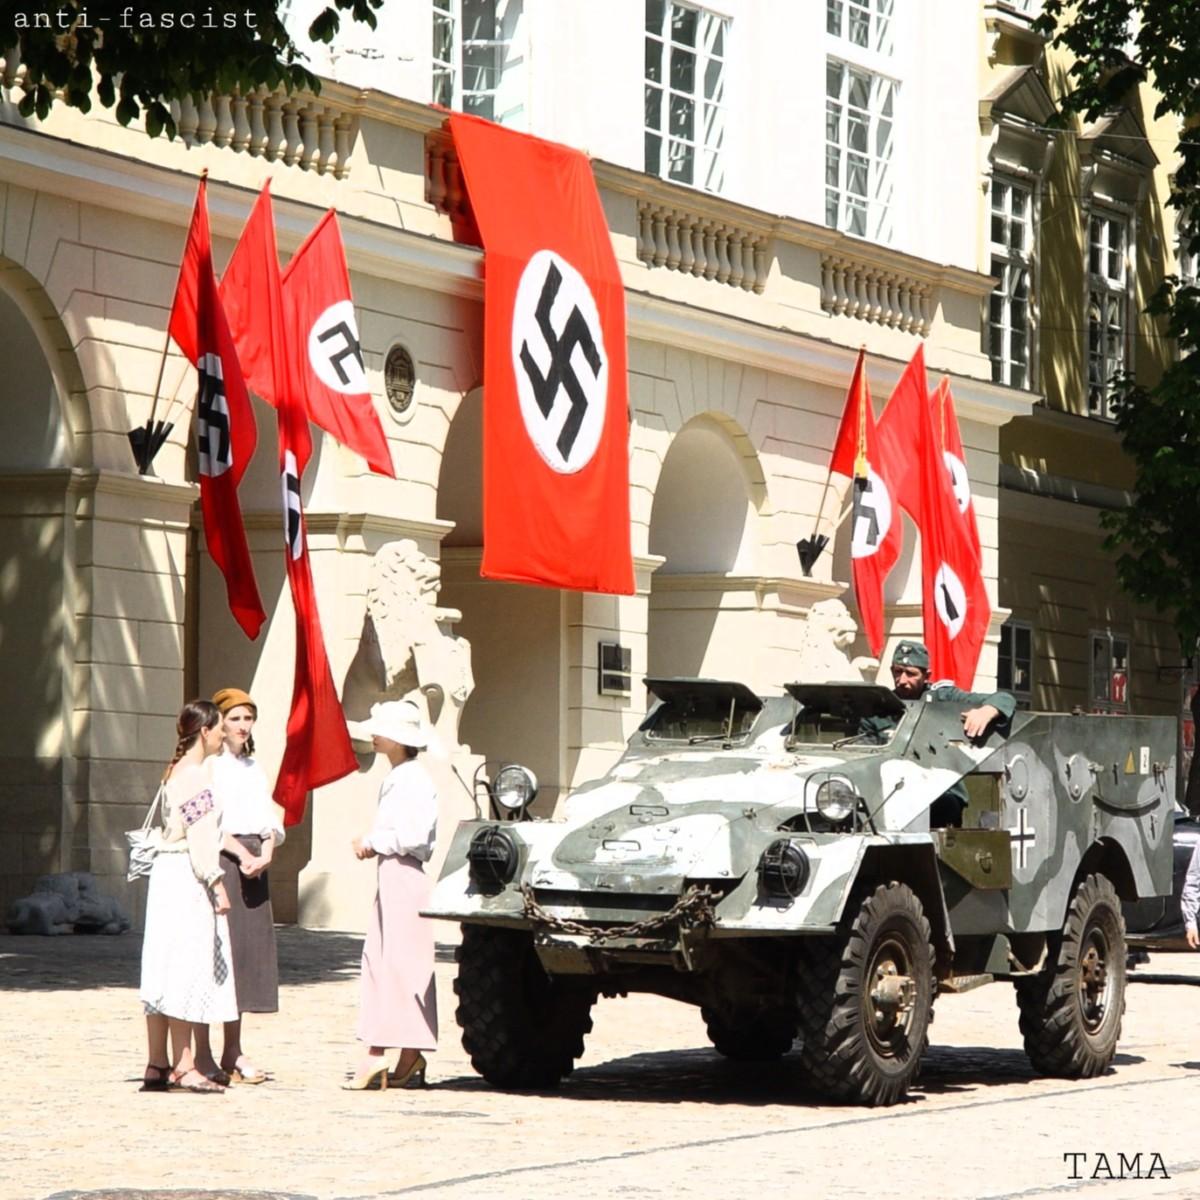 Anti-Fascist Struggle Day